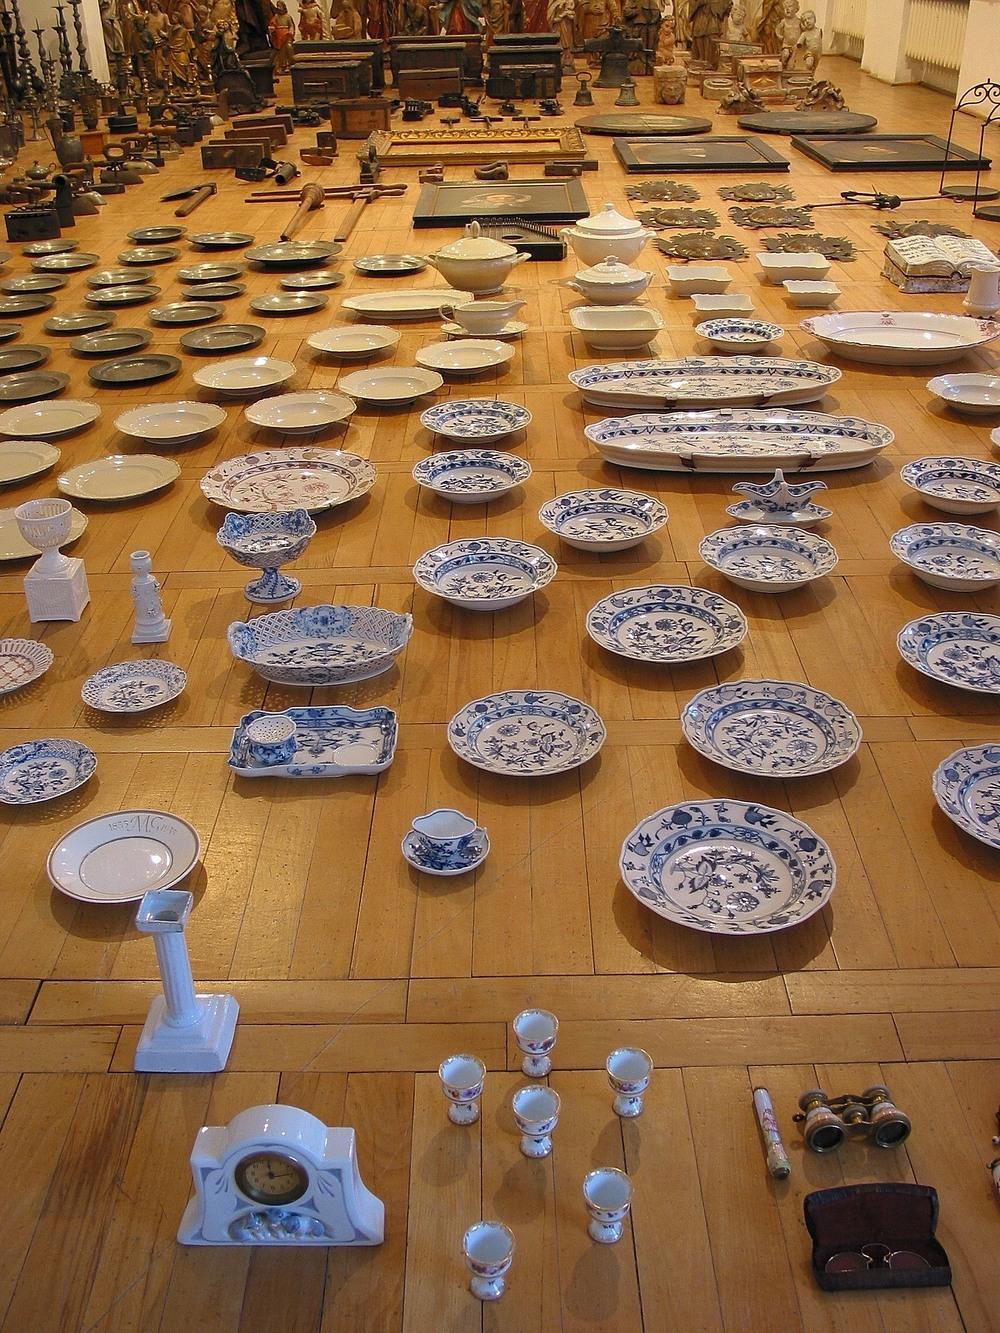 Inventory, 2003